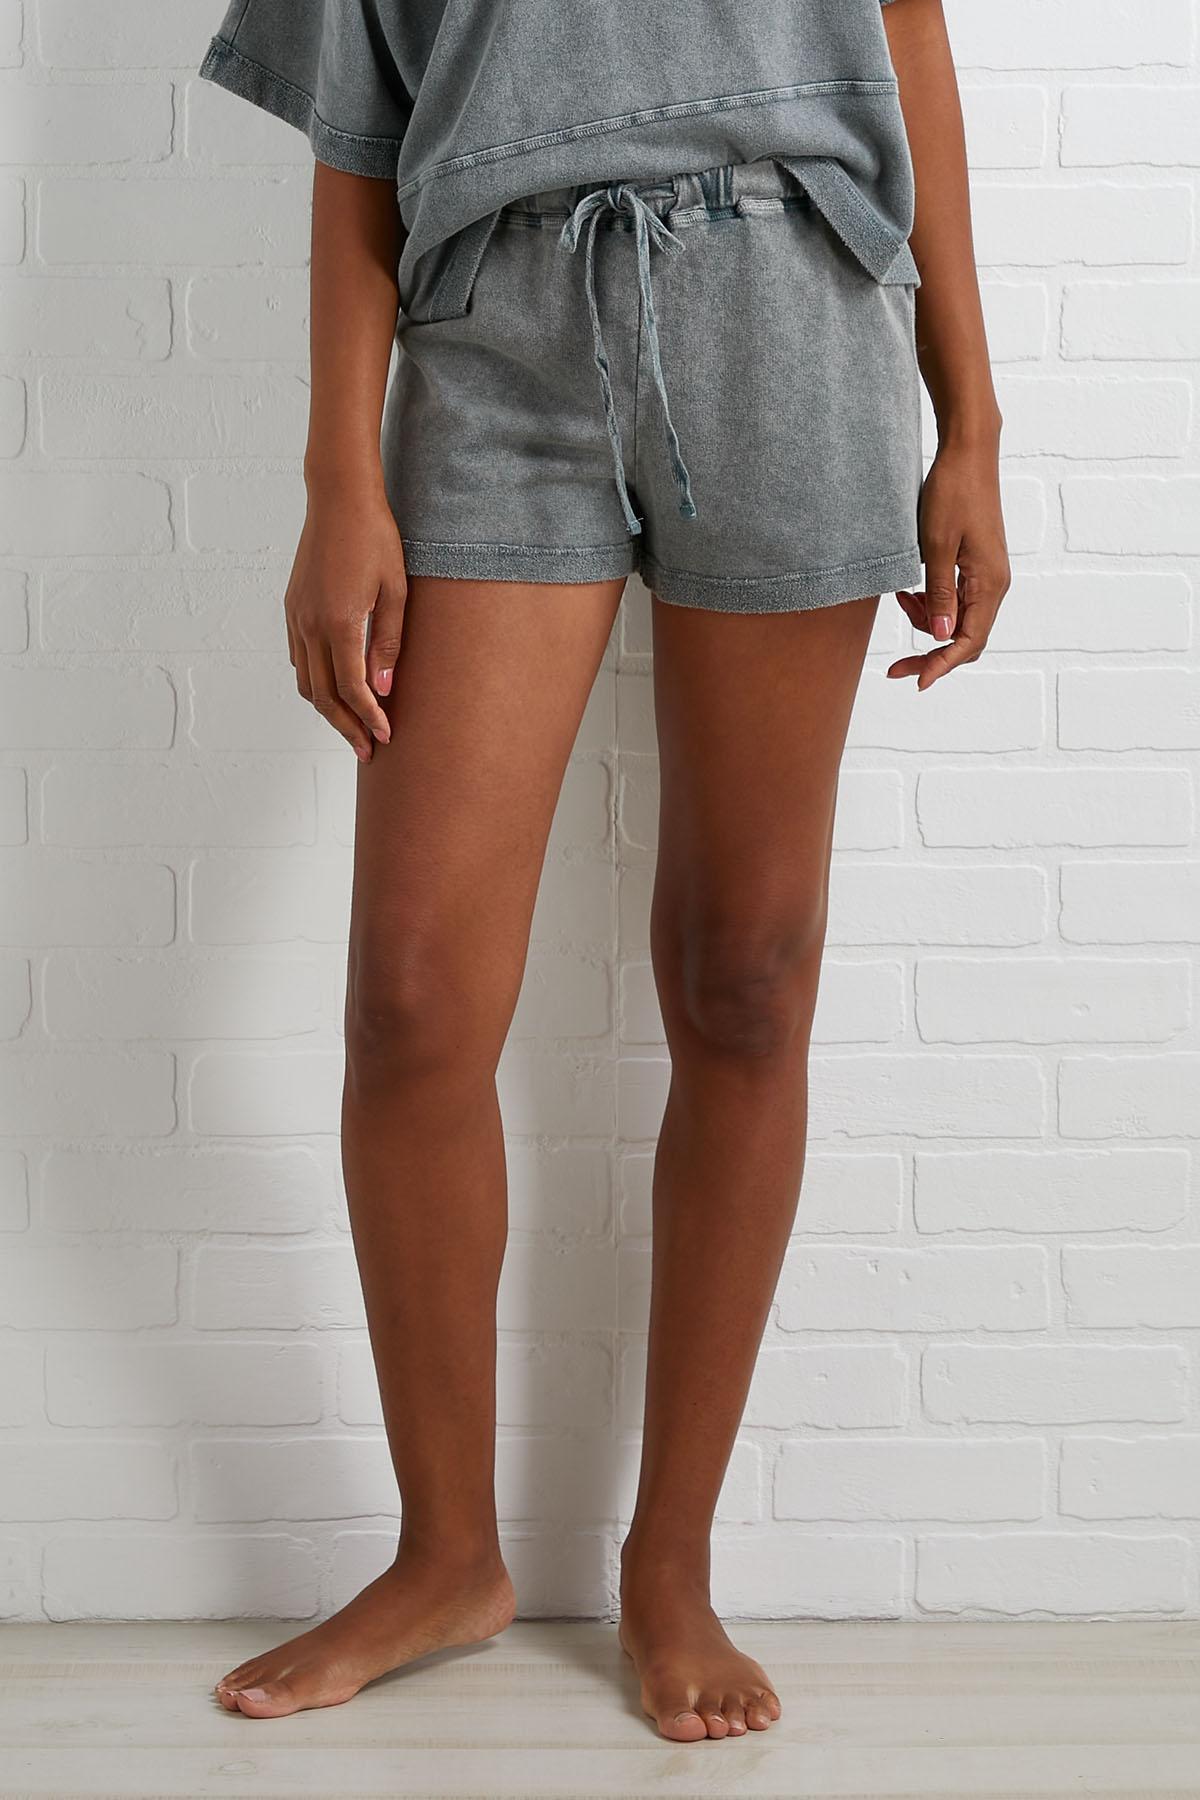 Keep It Lowkey Shorts